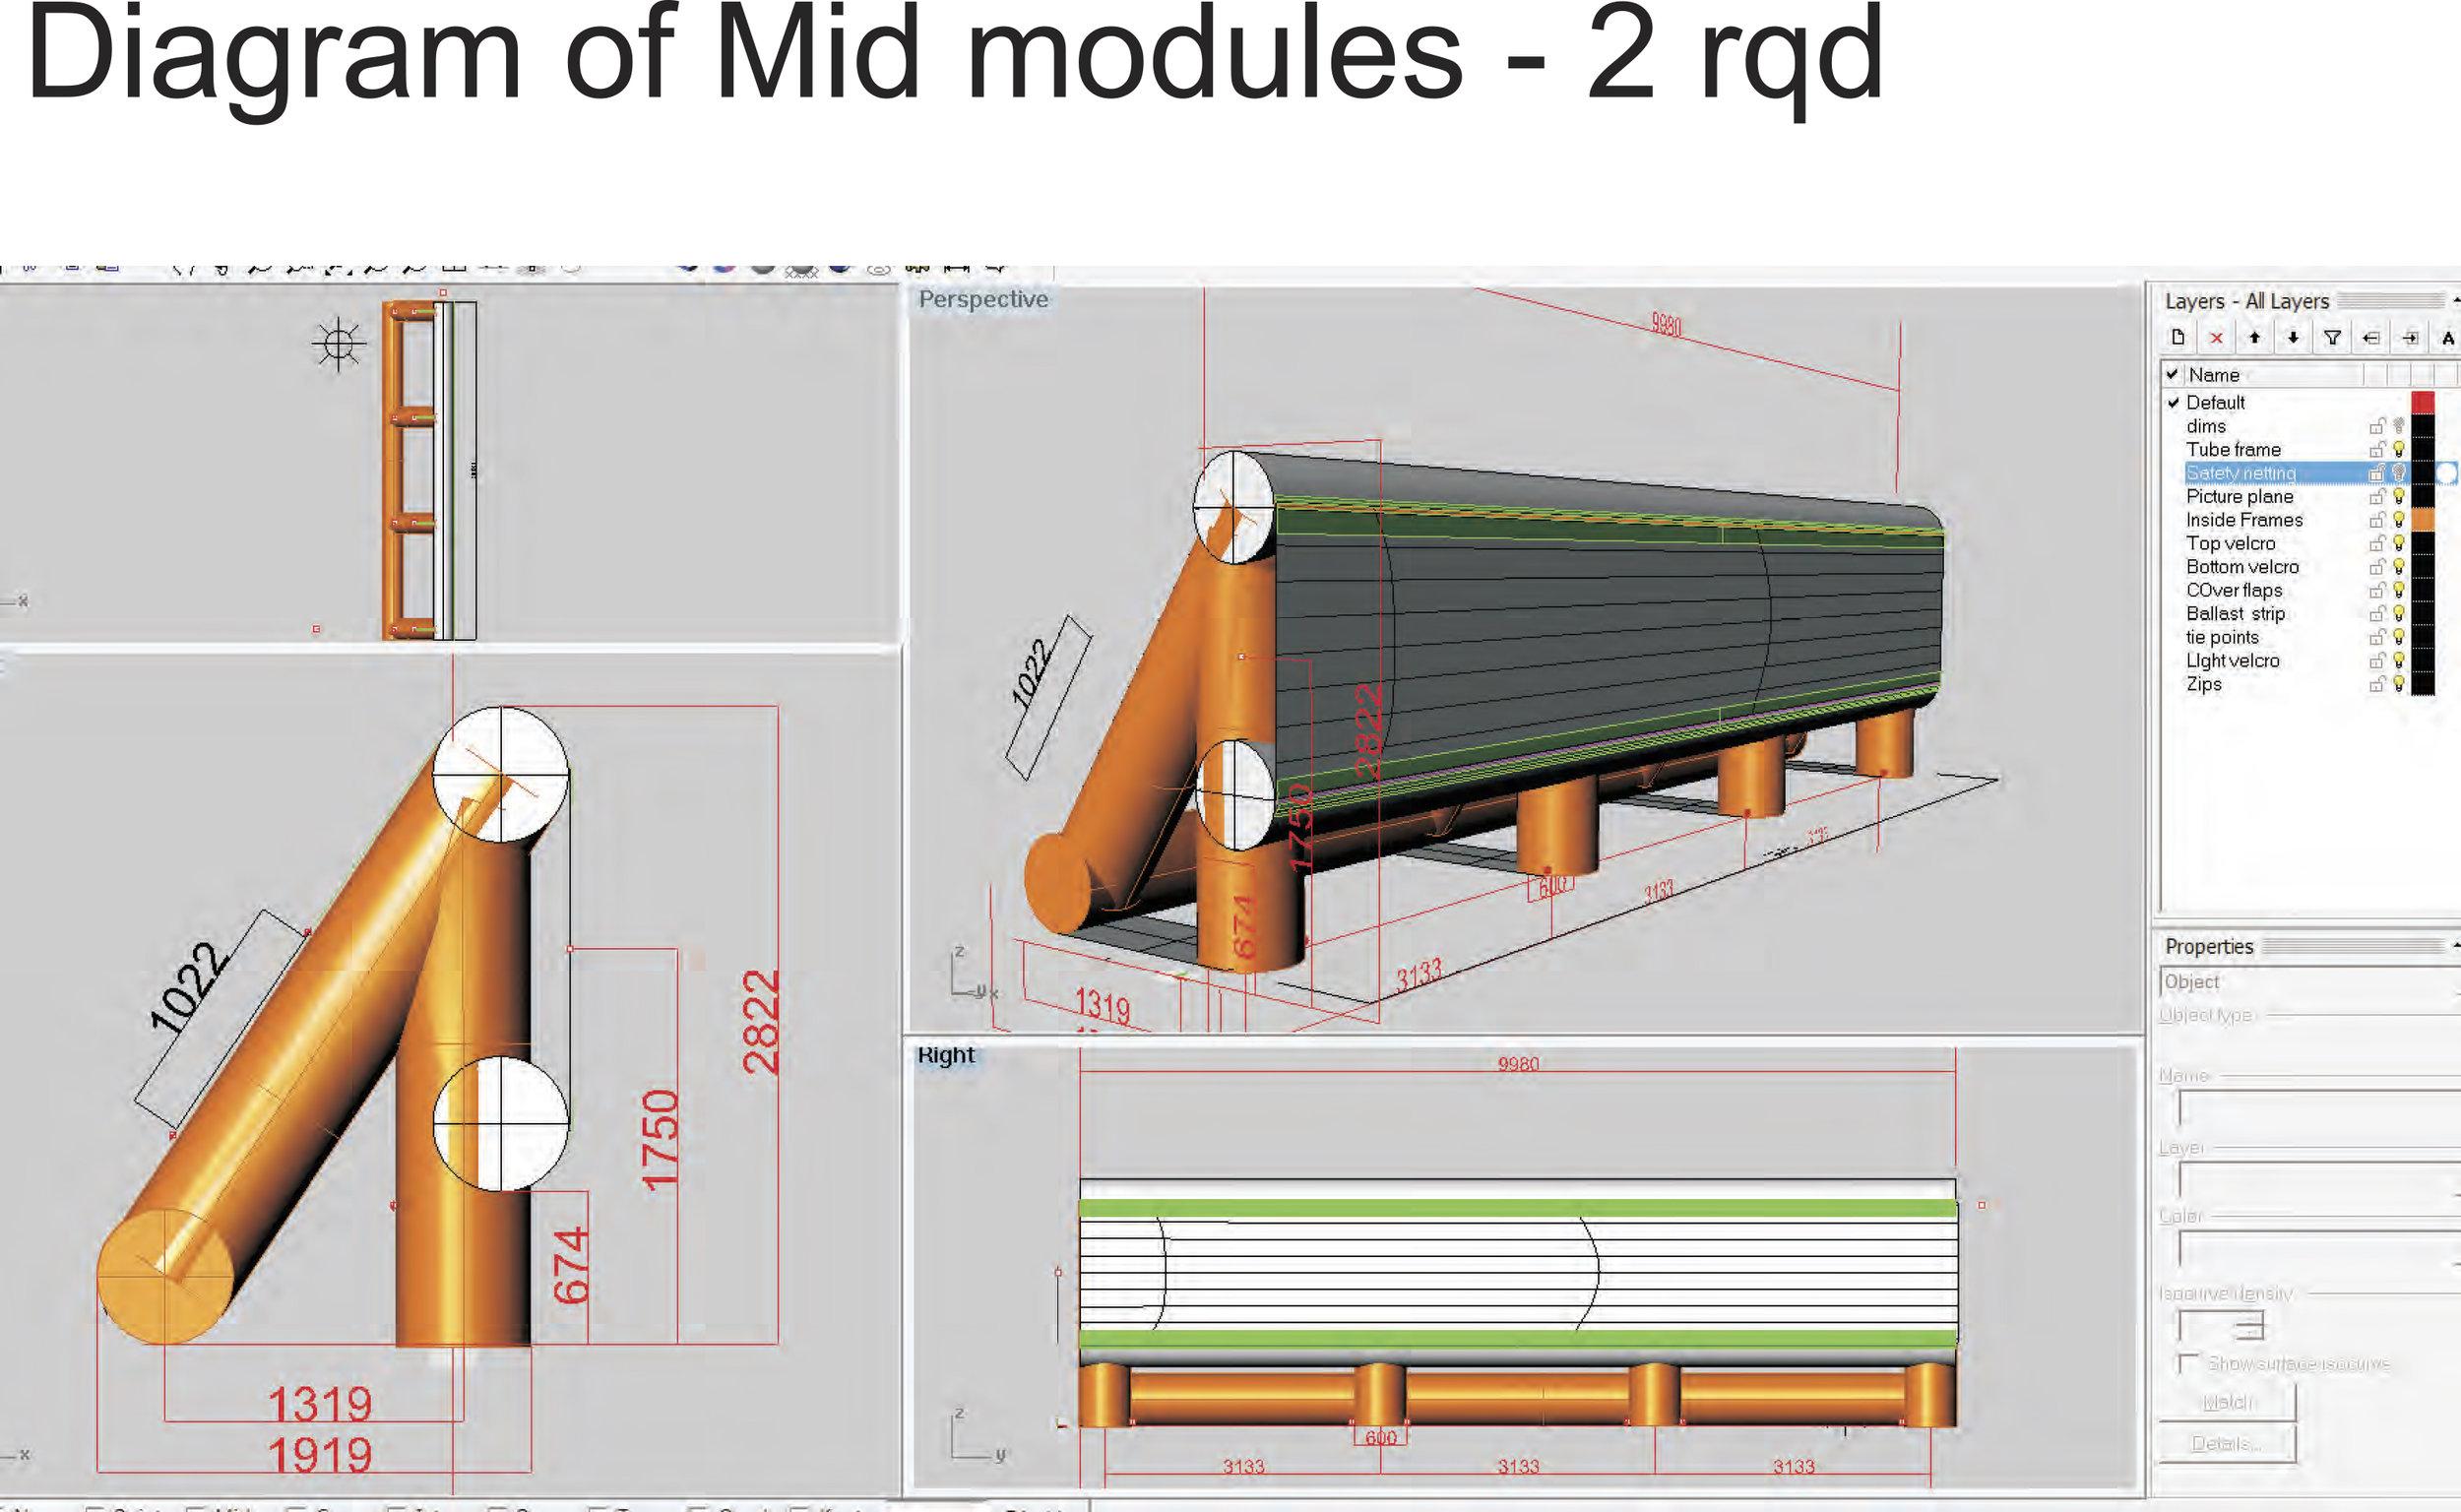 Production detailsLr-8.jpg